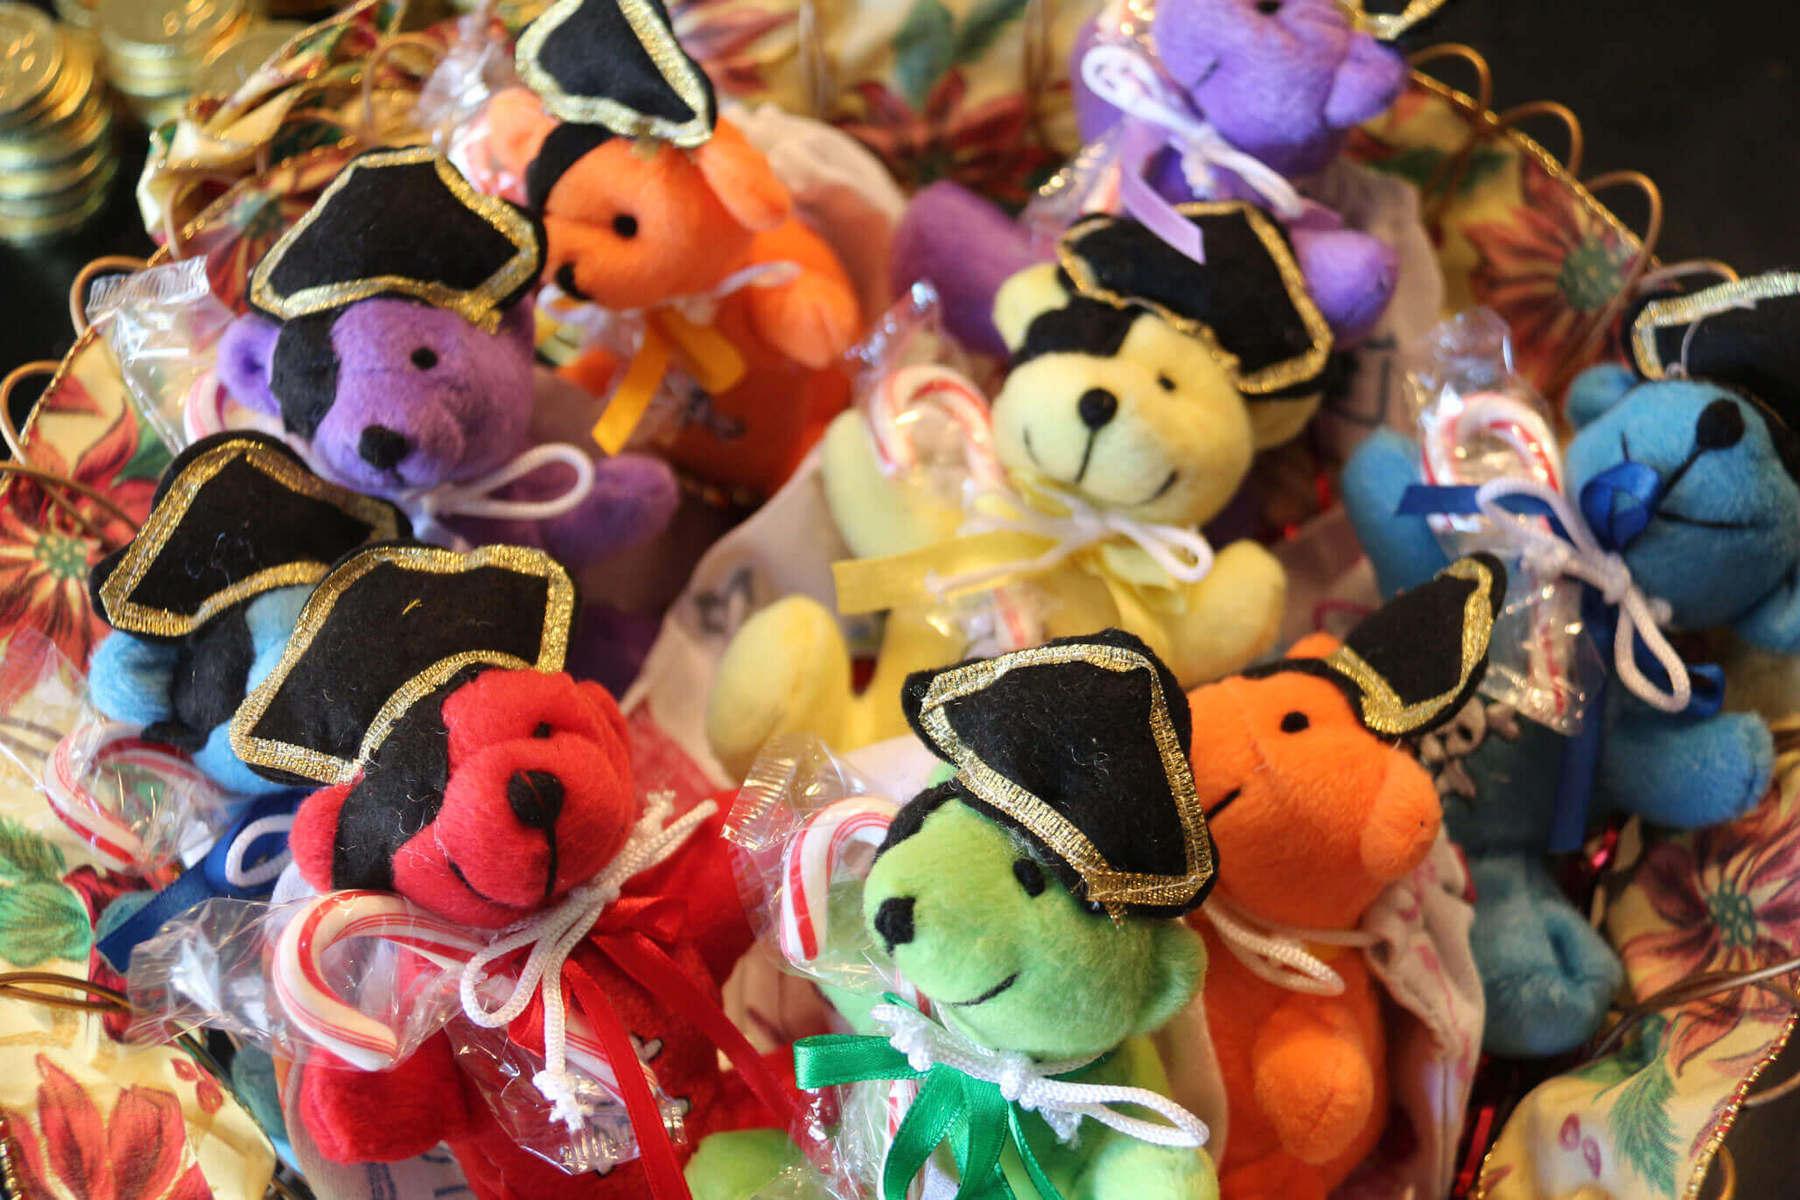 Pirate Bear Christmas Gifts